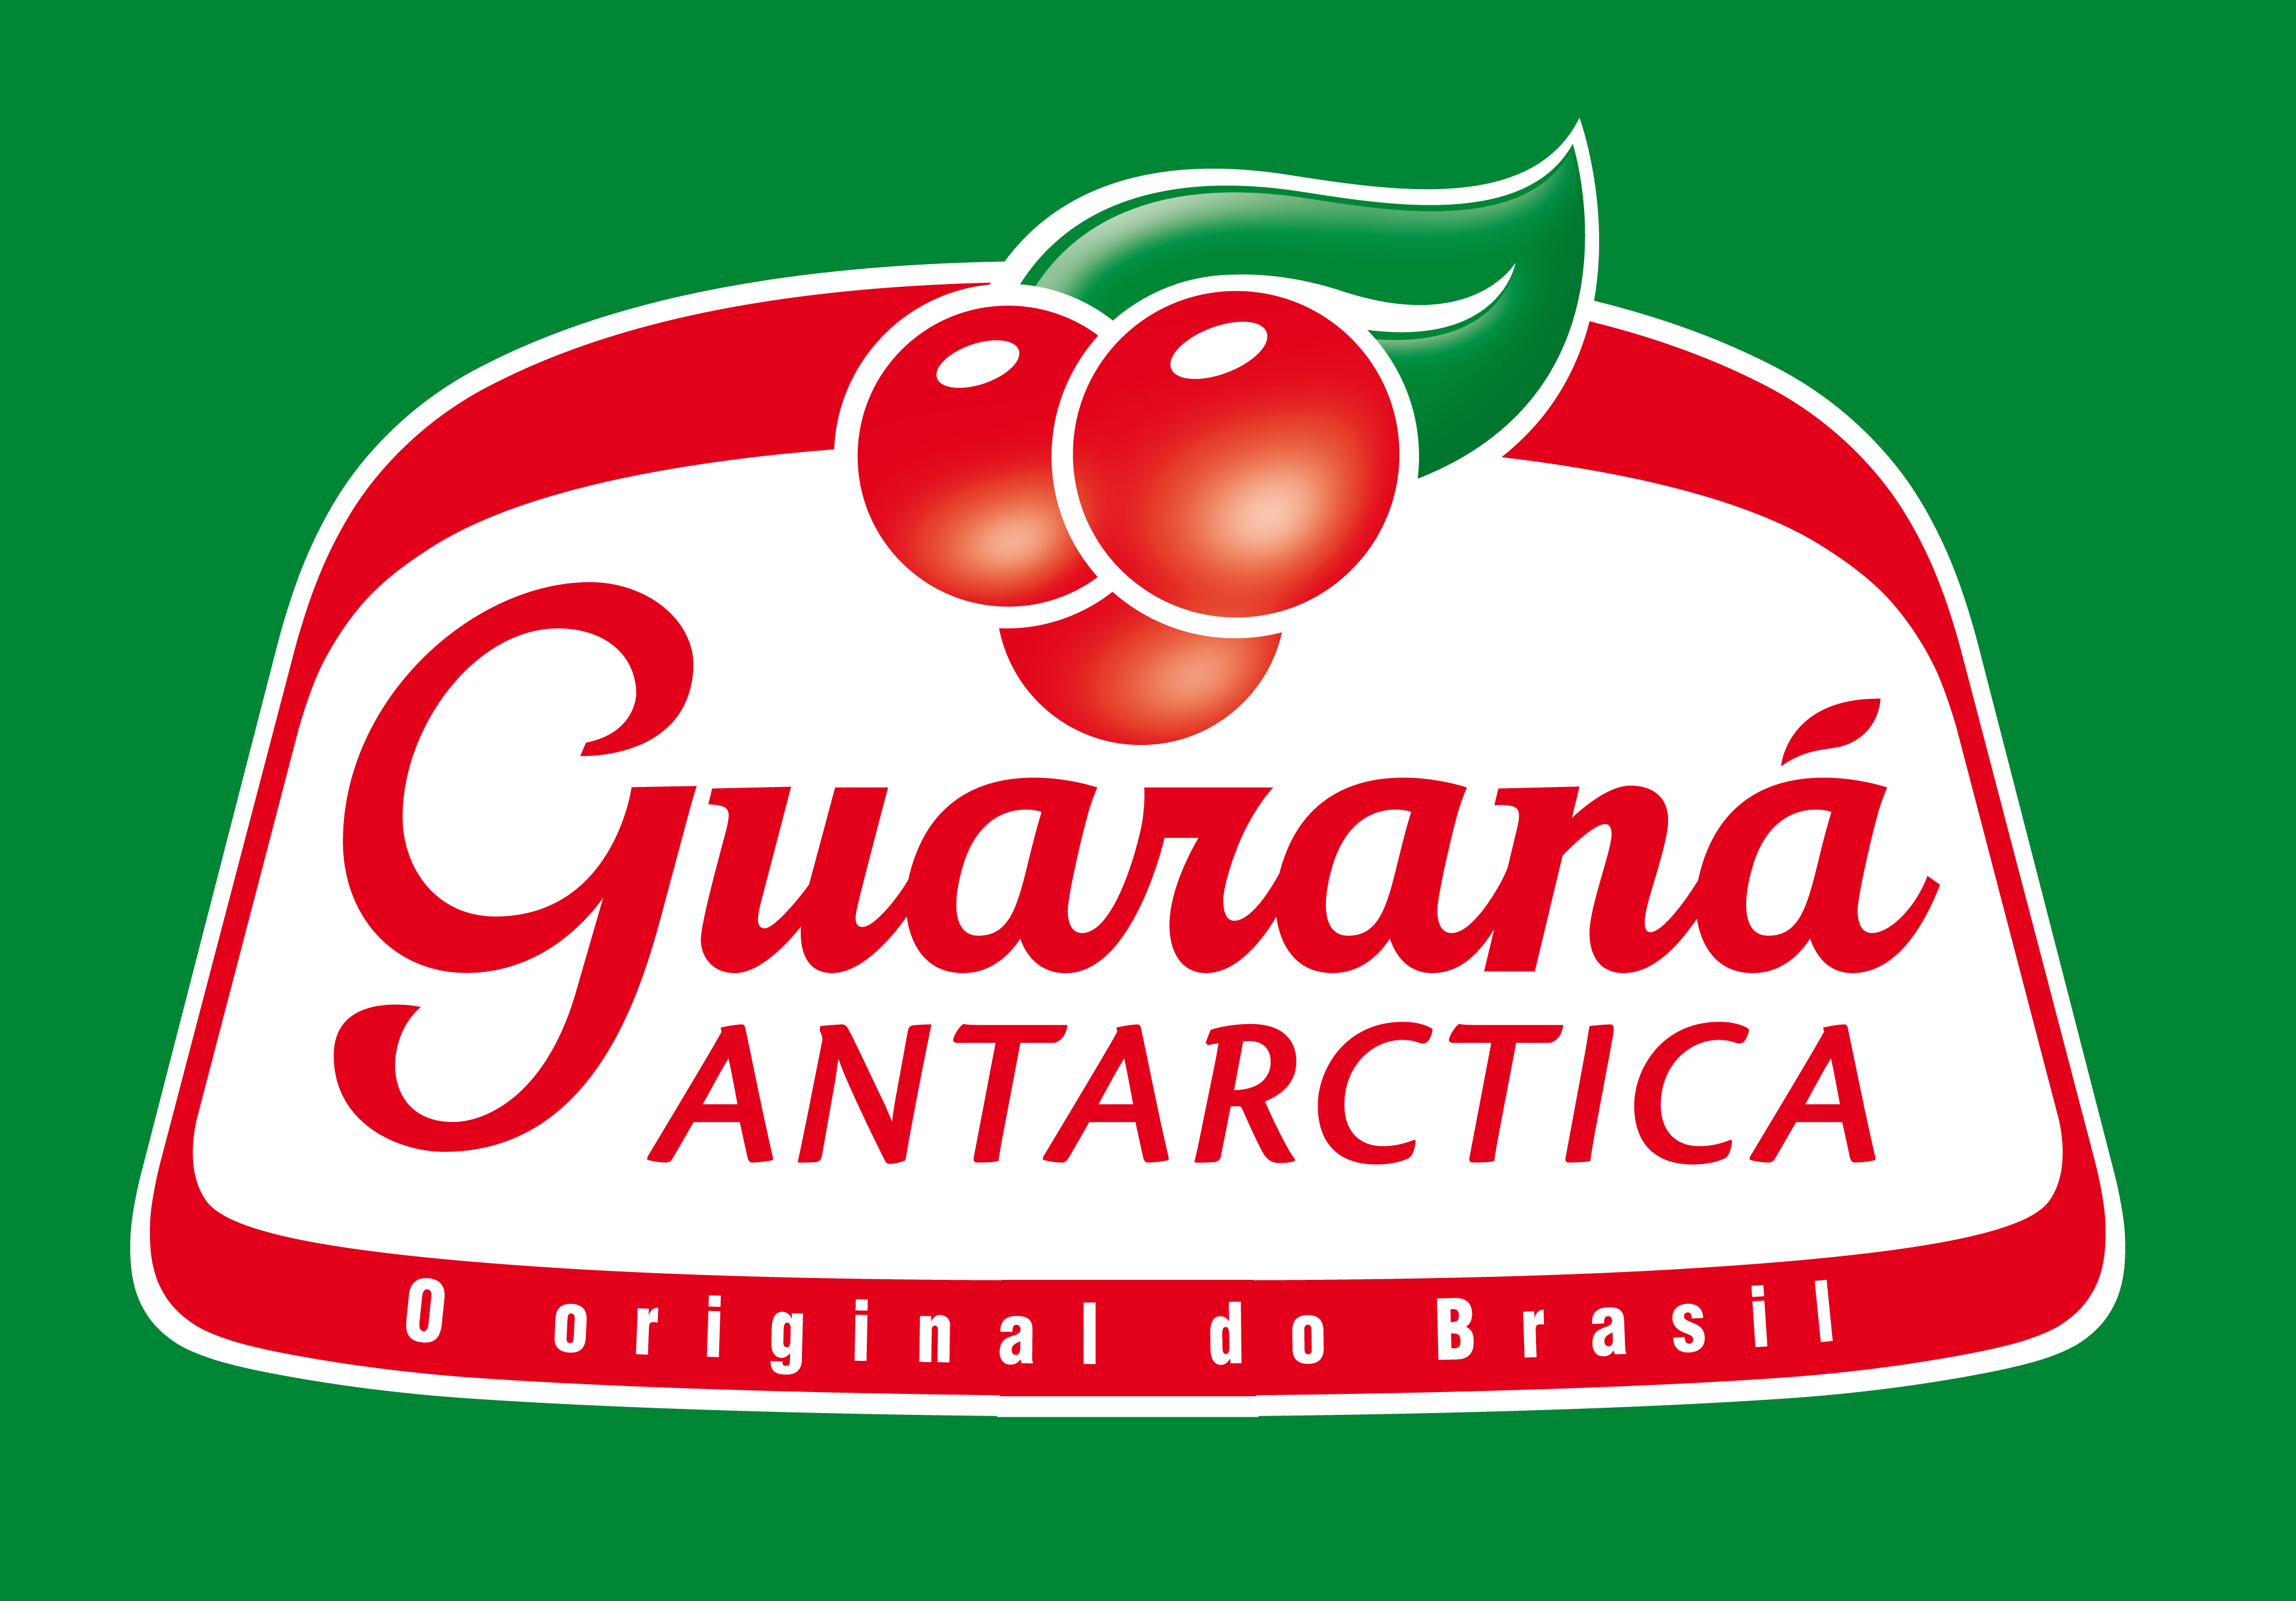 guarana logo antartica - Guaraná Antartica Logo